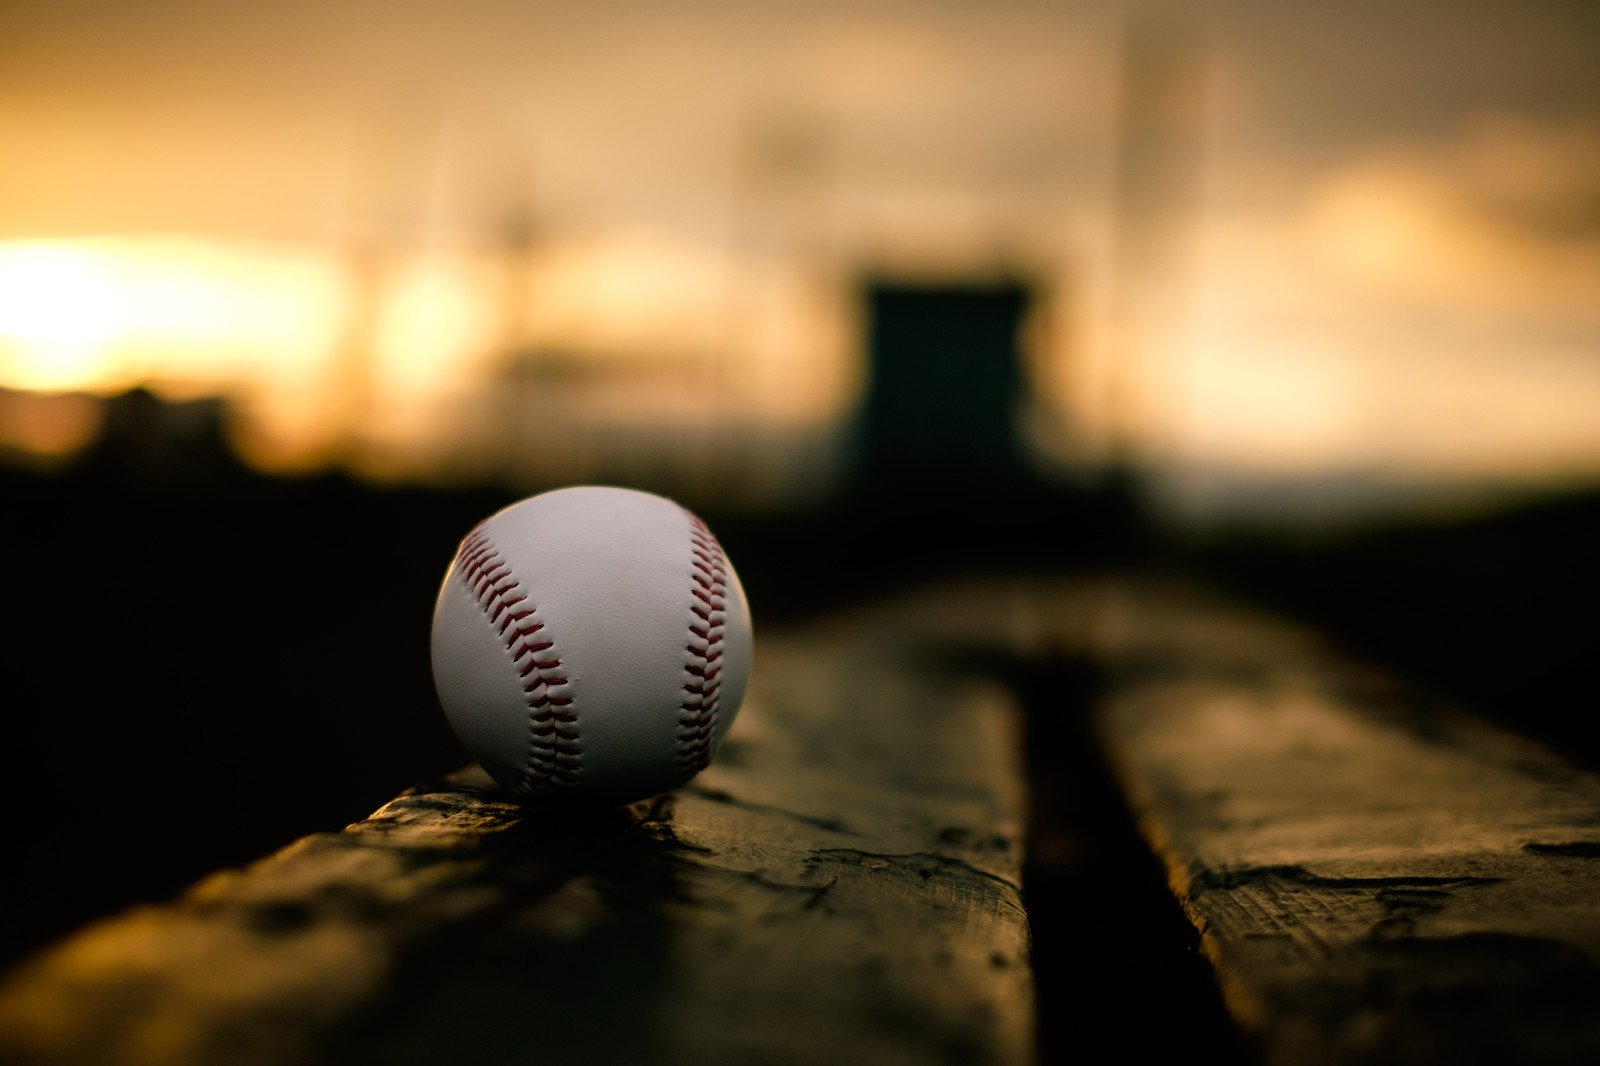 1600x1066xdscf9005 tp v jpg pagespeed ic wmei72ymmx.jpg?resize=1200,630 - 日付をまたいだこともある!プロ野球の最長試合は6時間26分